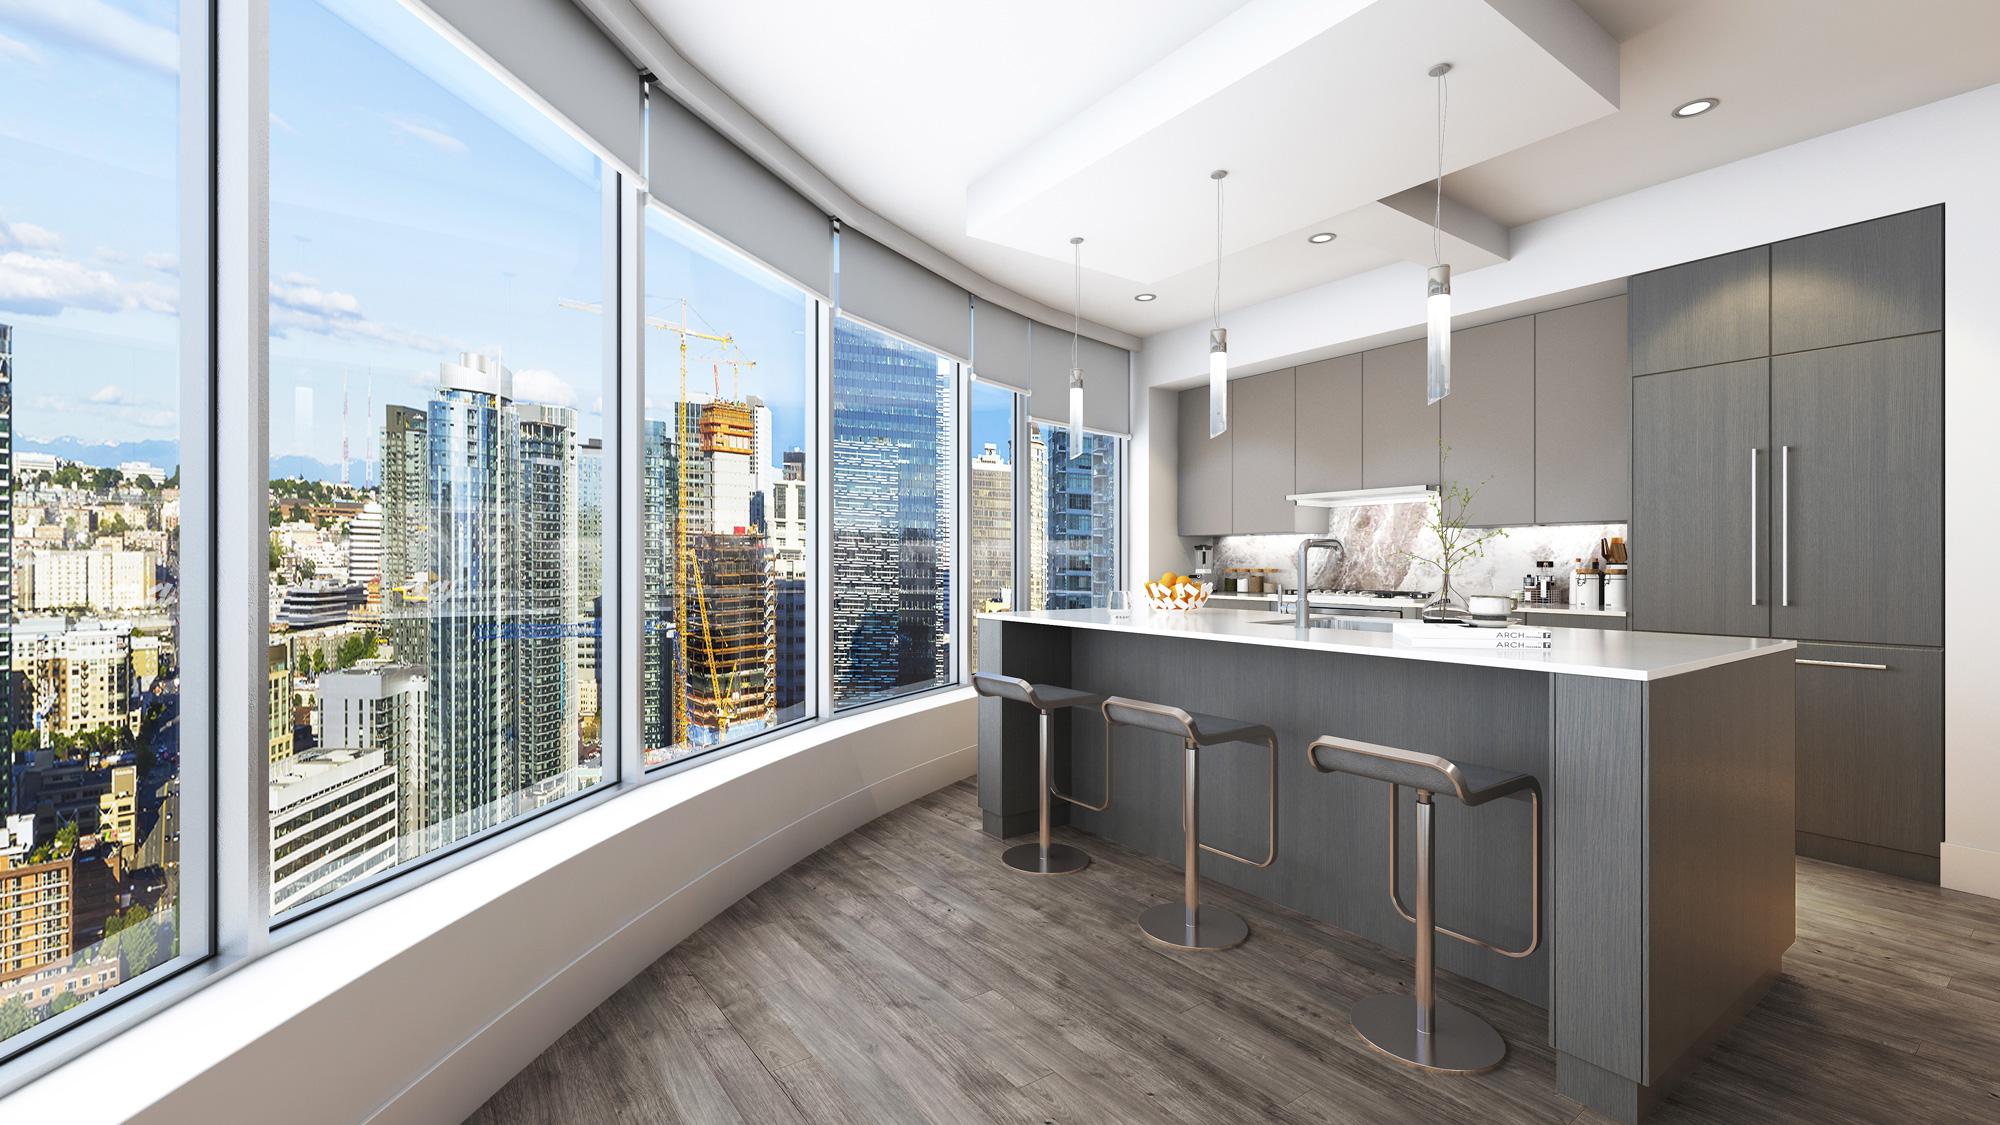 20181123_spire_unit_E_kitchen-cool-FINAL.jpg